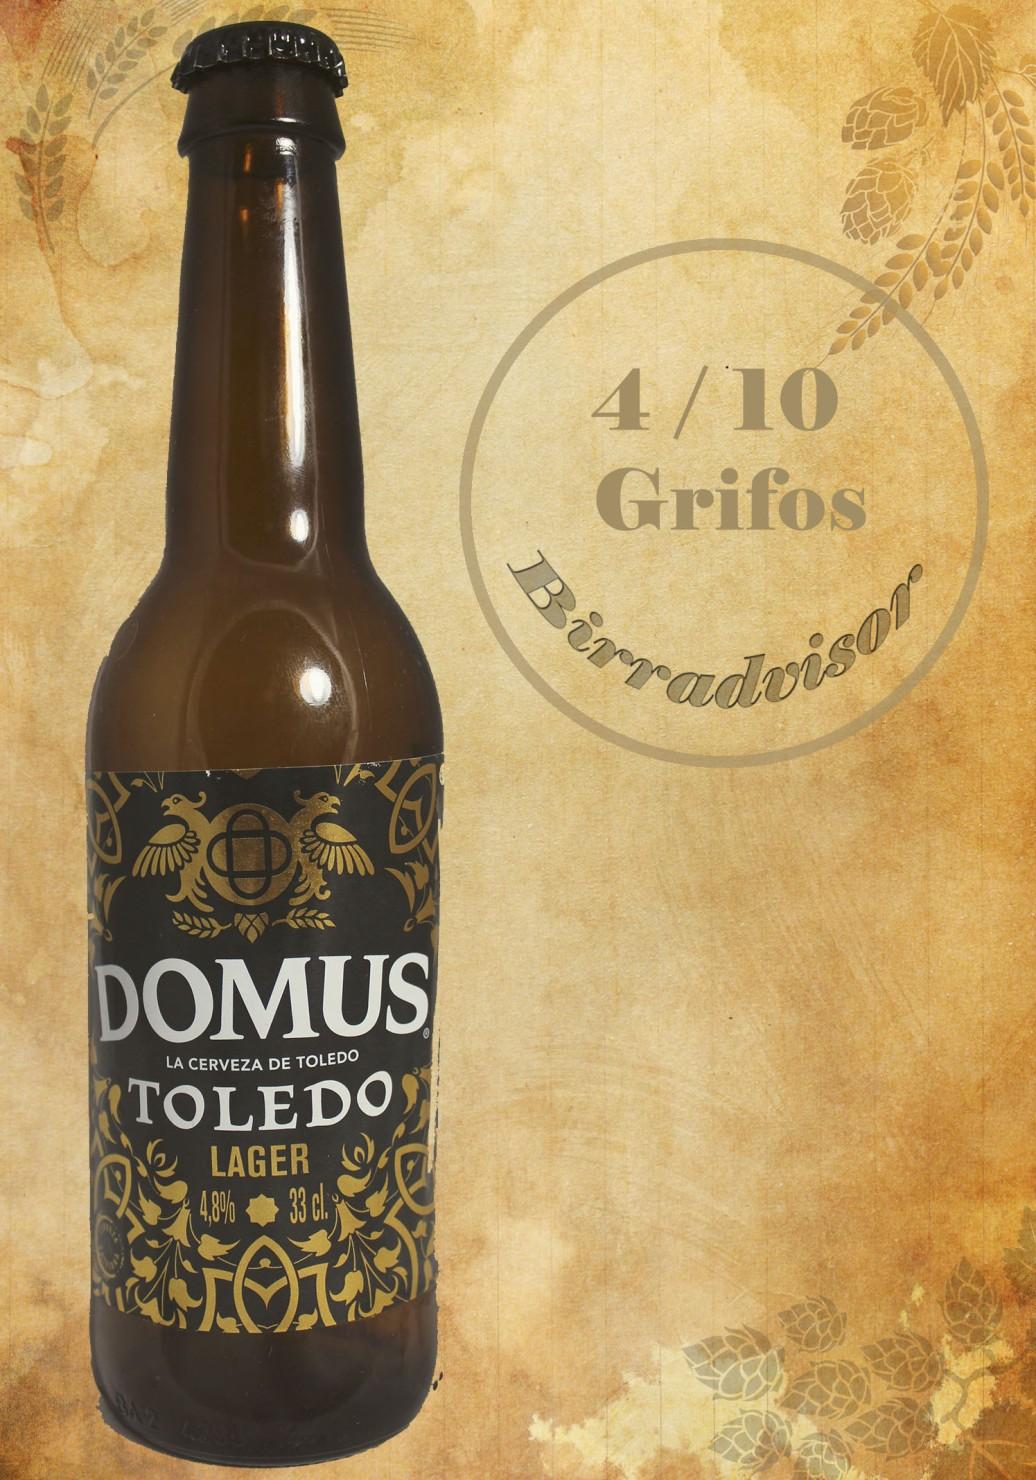 Domus (toledo)